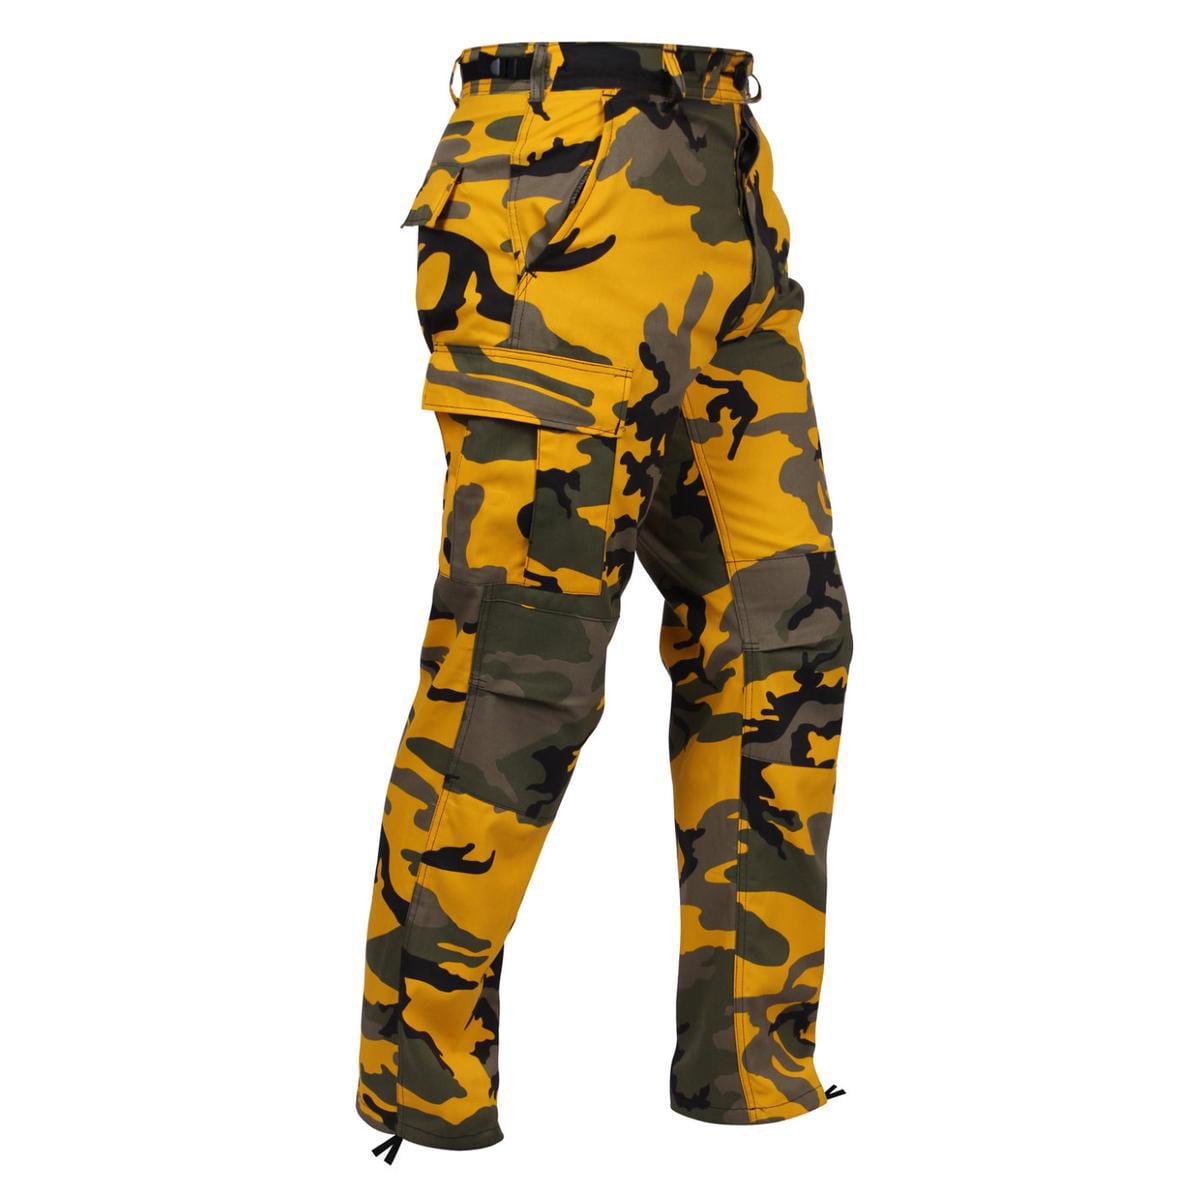 Ultra Force Savage Orange Camouflage B.D.U. Pants